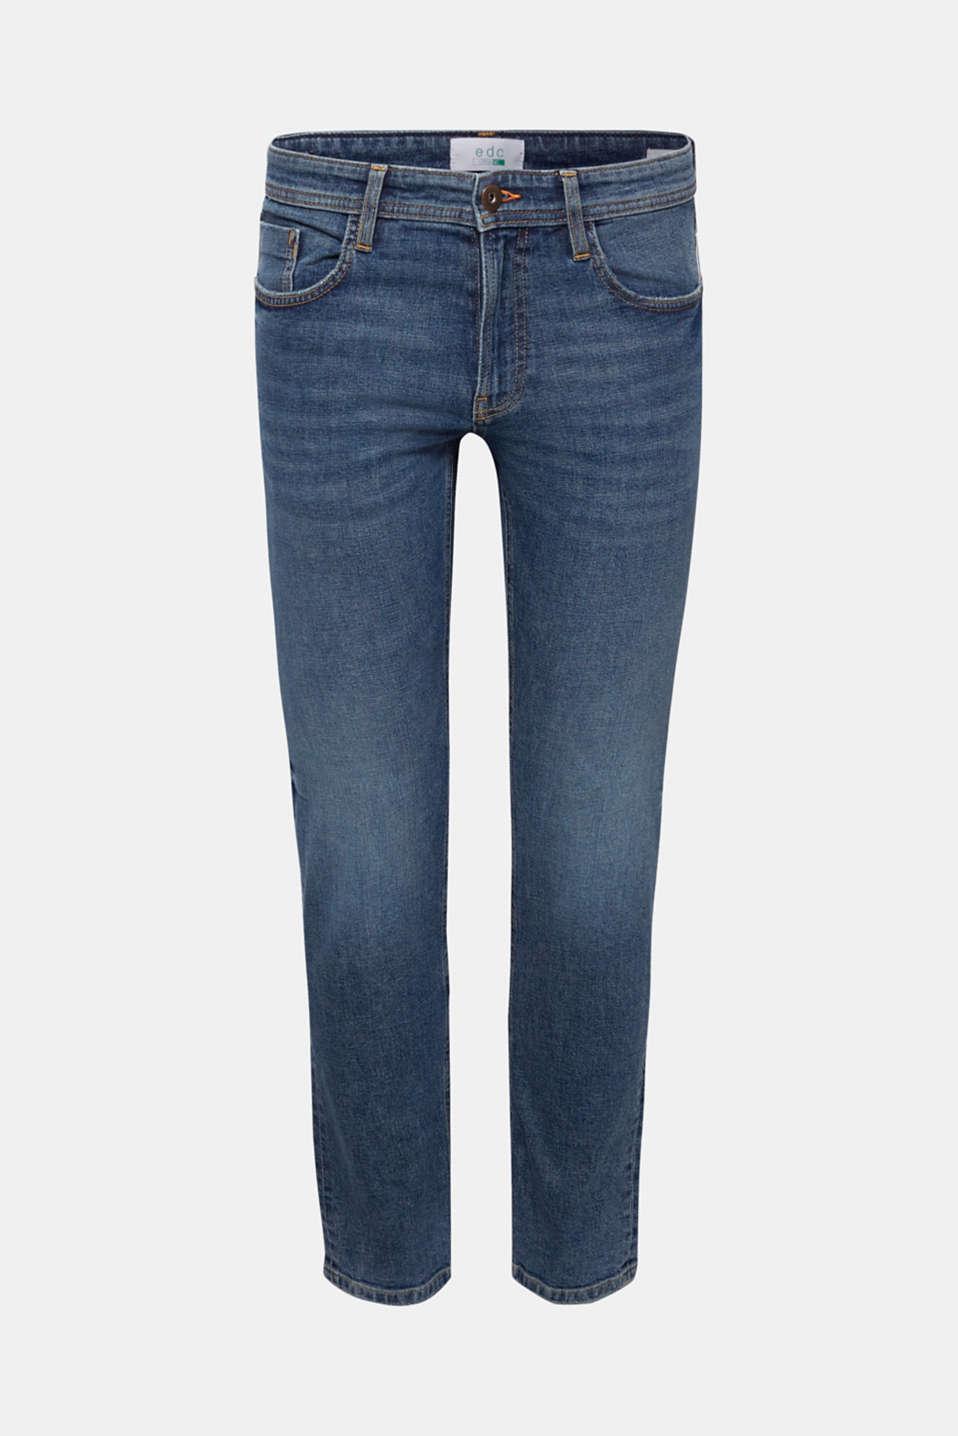 Pants denim Slim fit, BLUE MEDIUM WASH, detail image number 5